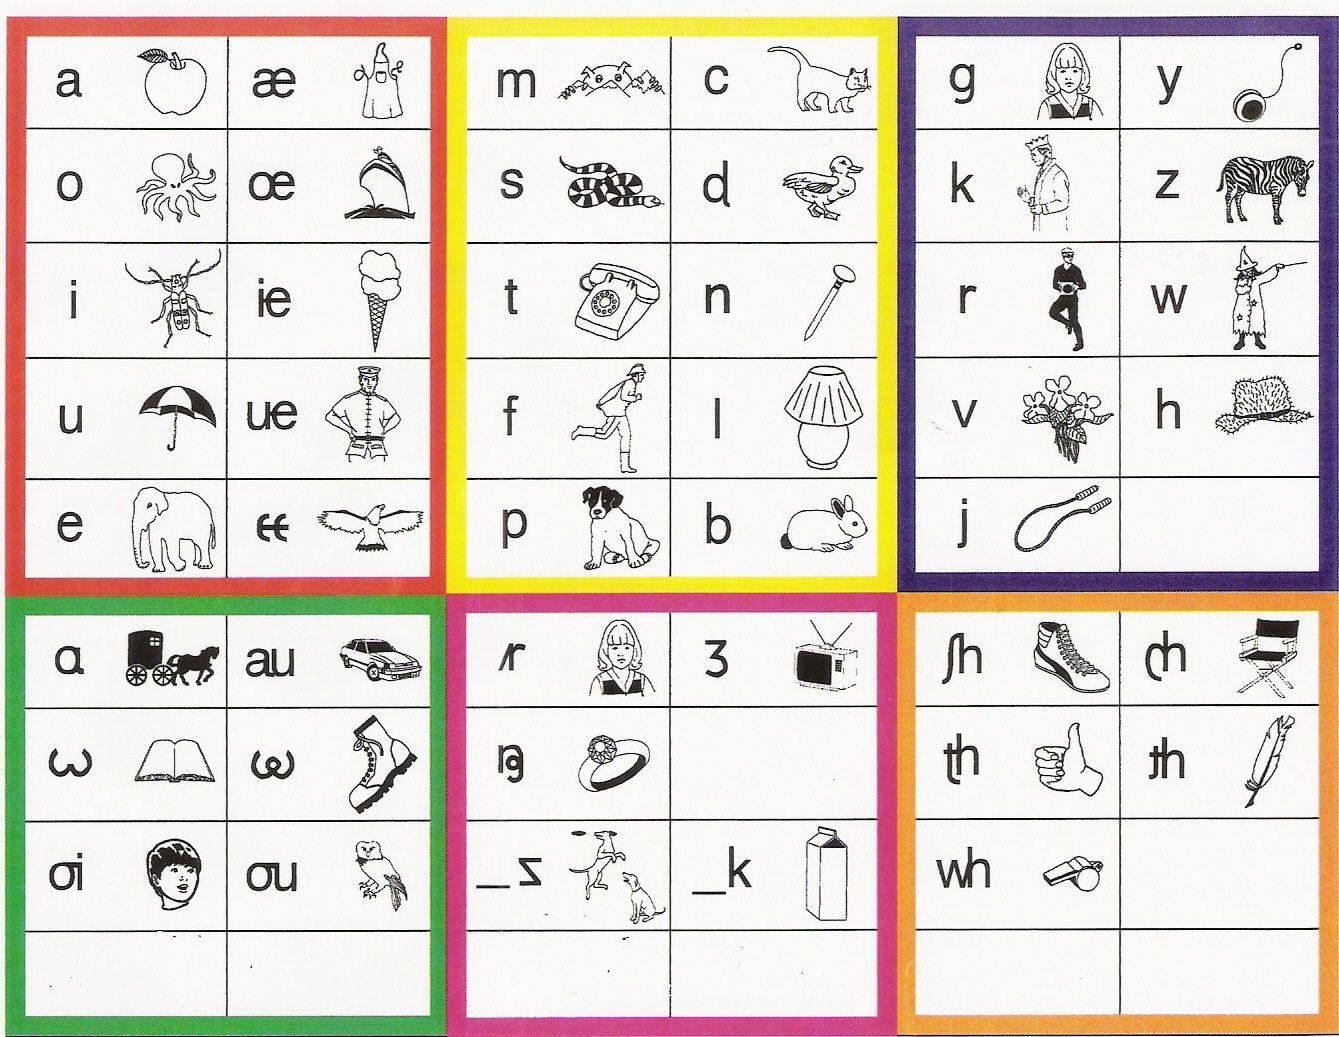 Teacher development transcribe english to ipa 3d - International phonetic alphabet table ...